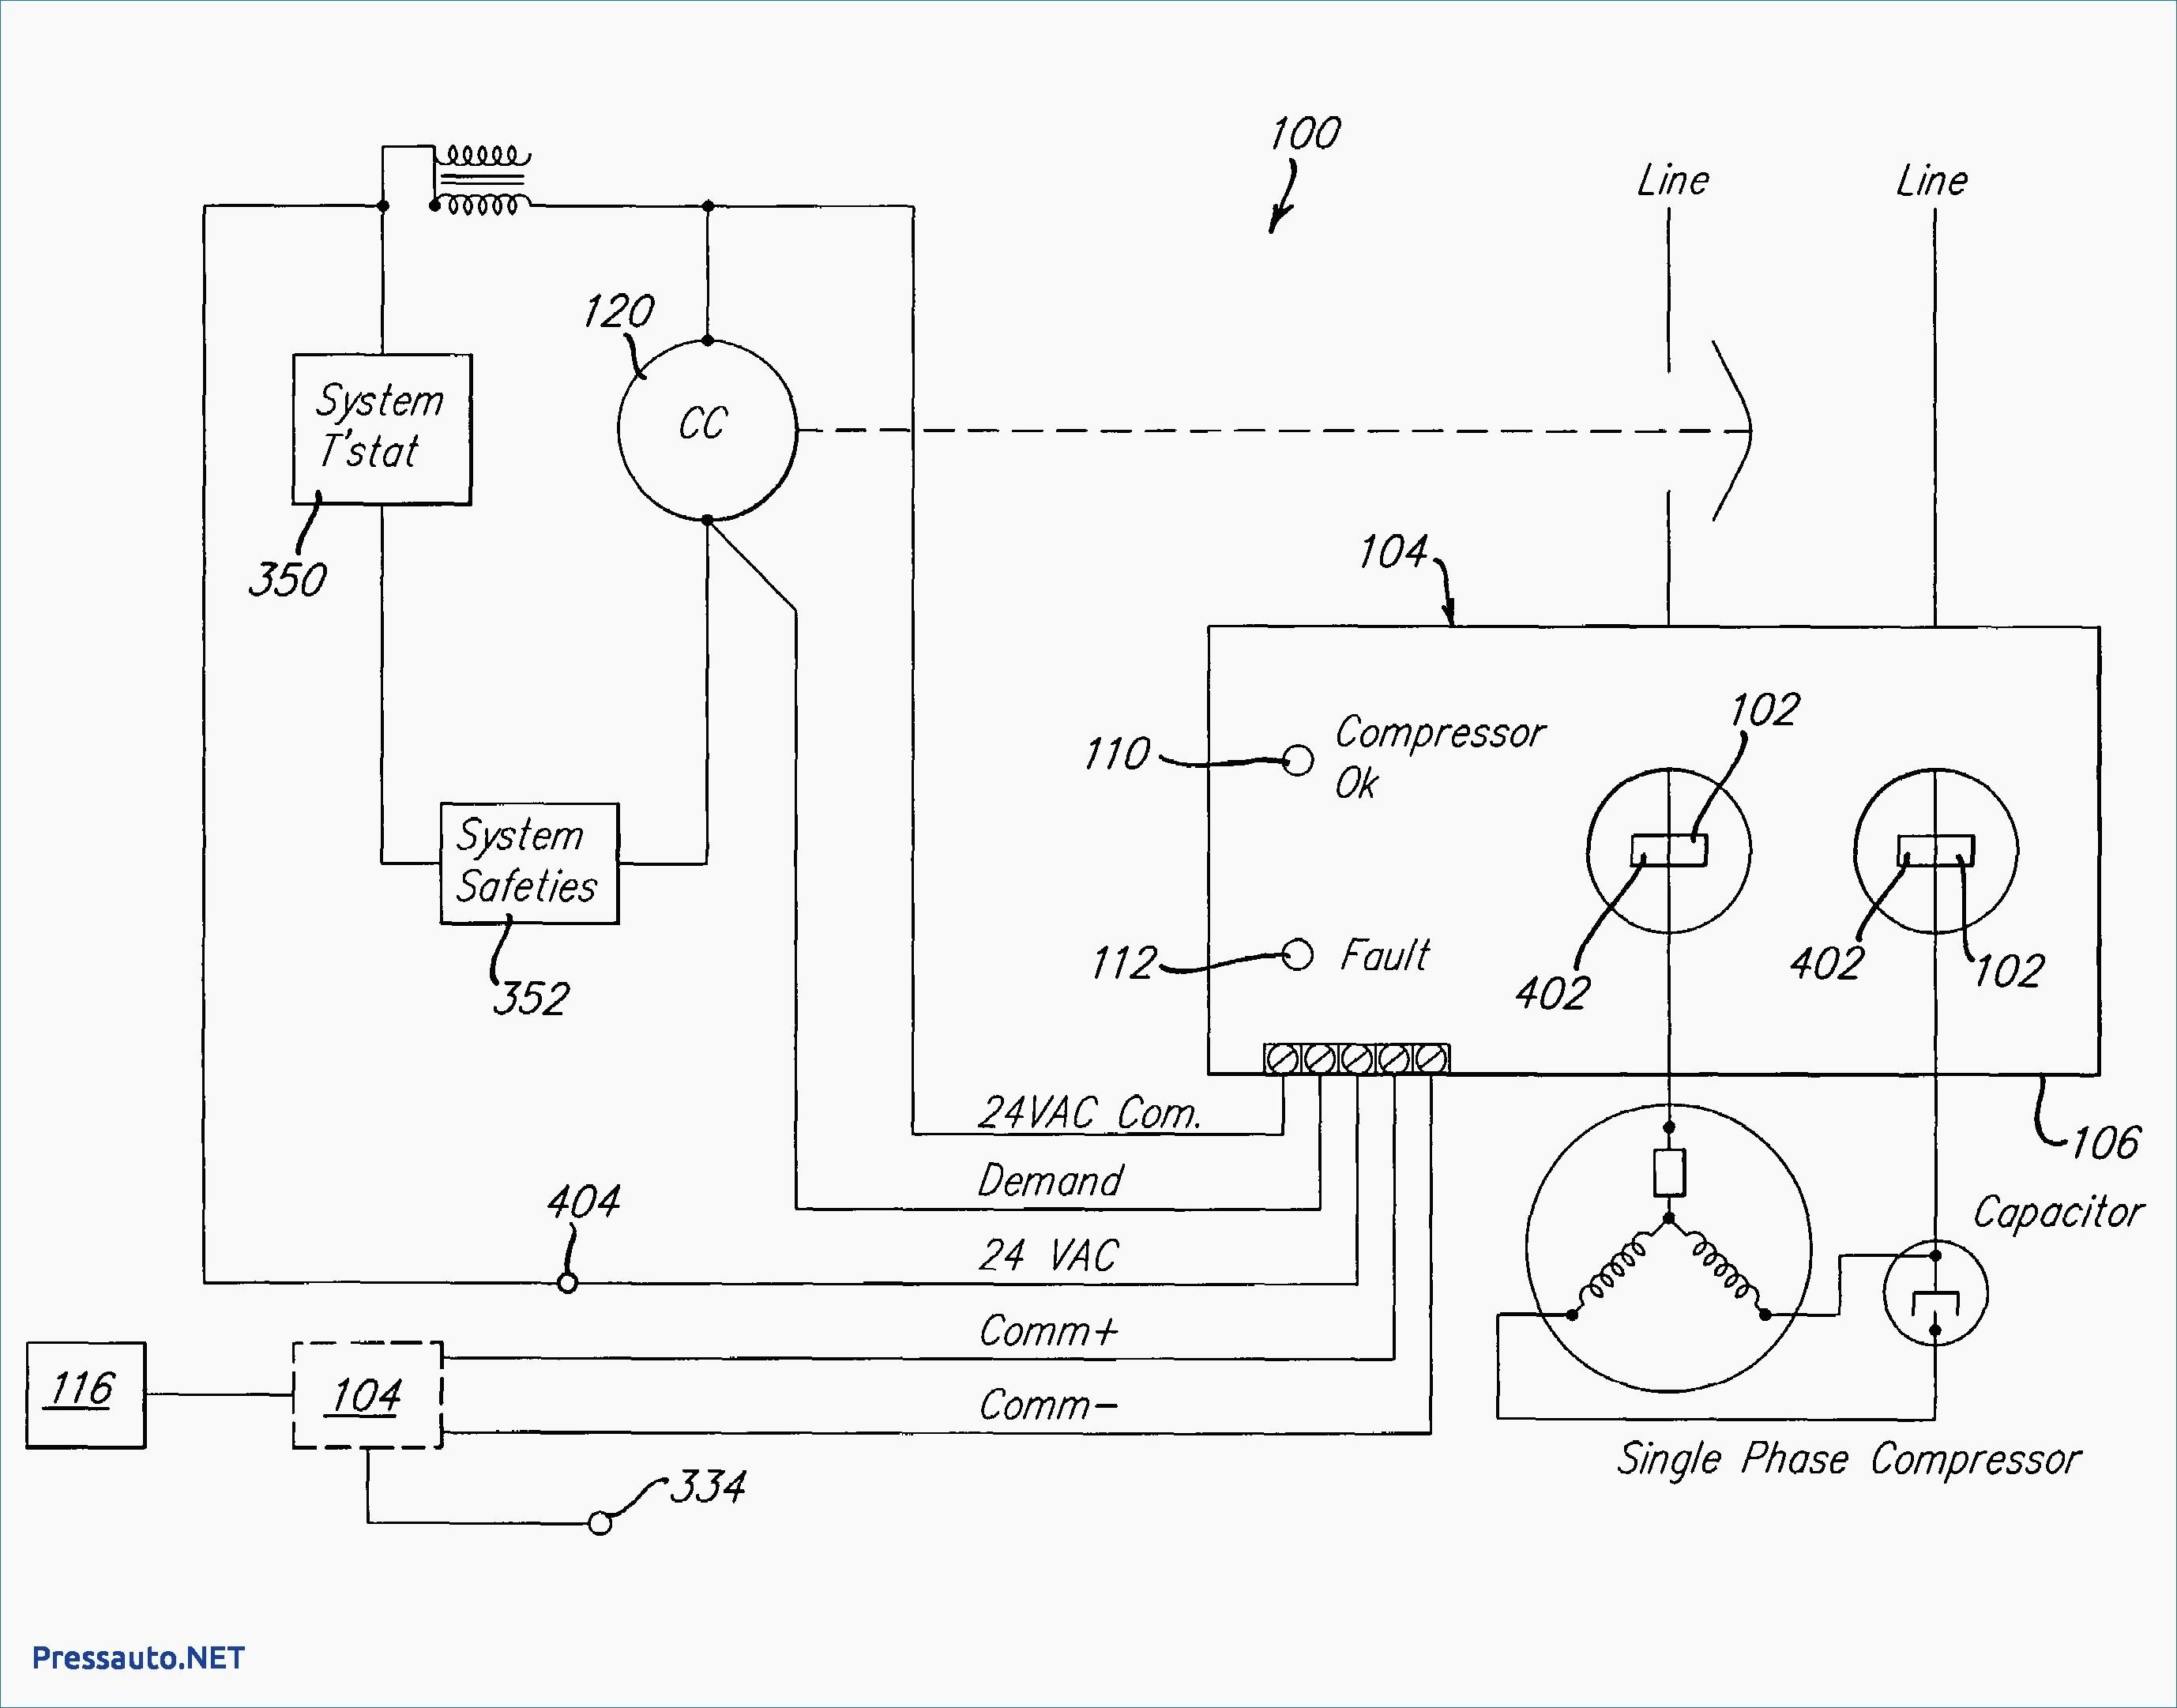 Hvac Condenser Wiring Diagram Inspirationa 3 Wire Condenser Fan Motor Wiring Diagram Lovely Fantastic Ac Inside